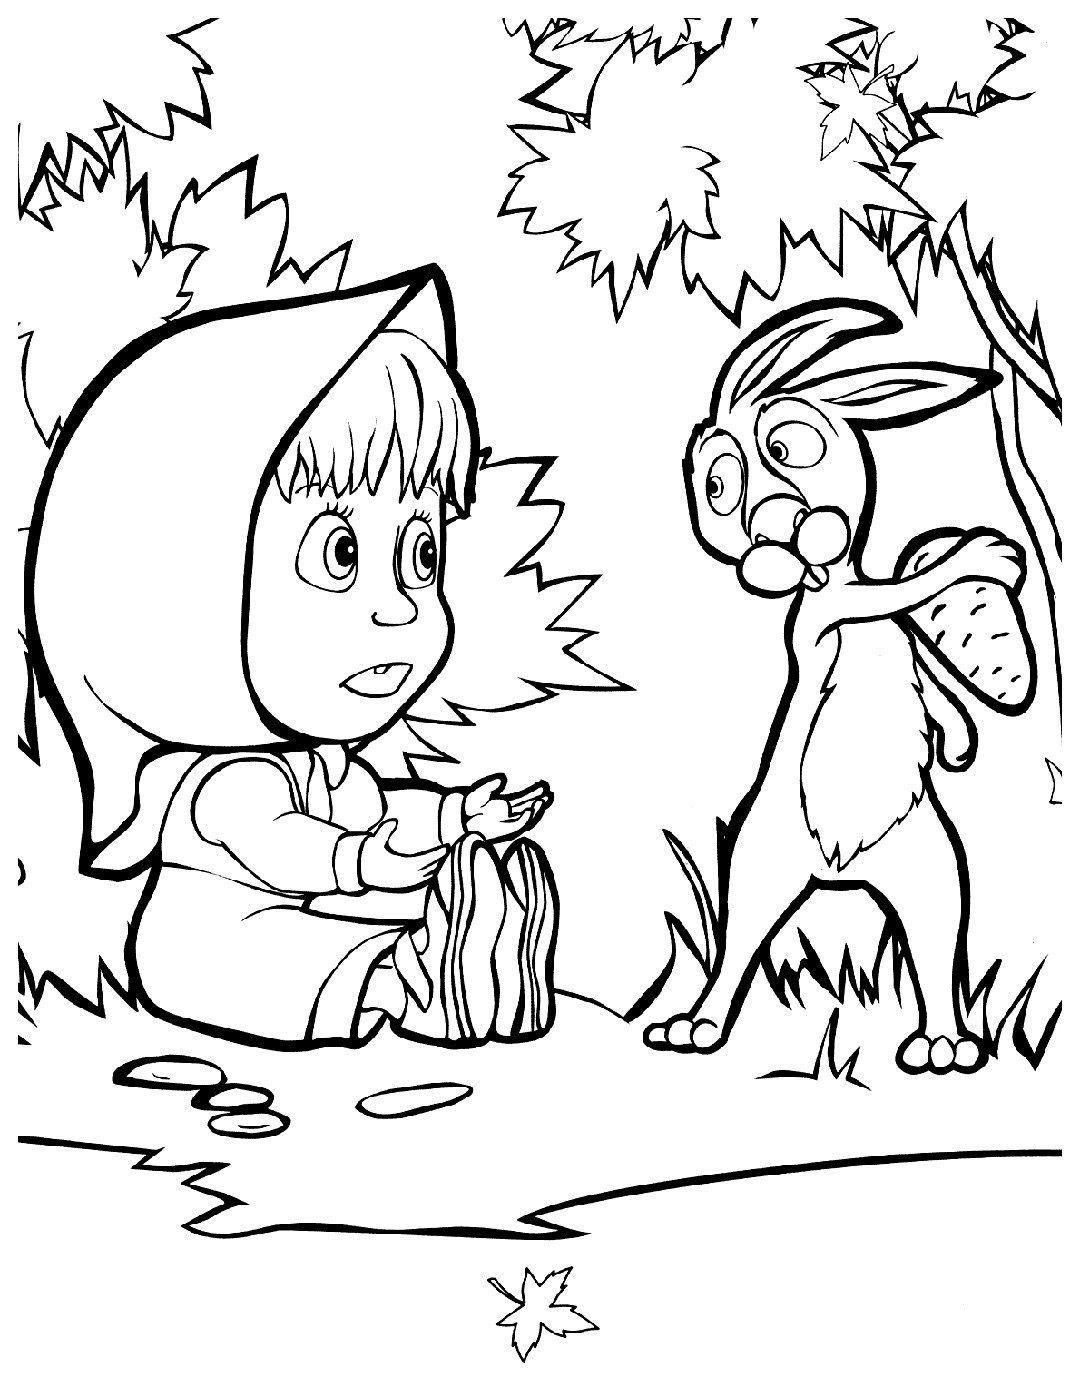 Маша и заяц - Картинка для раскрашивания красками-гуашью